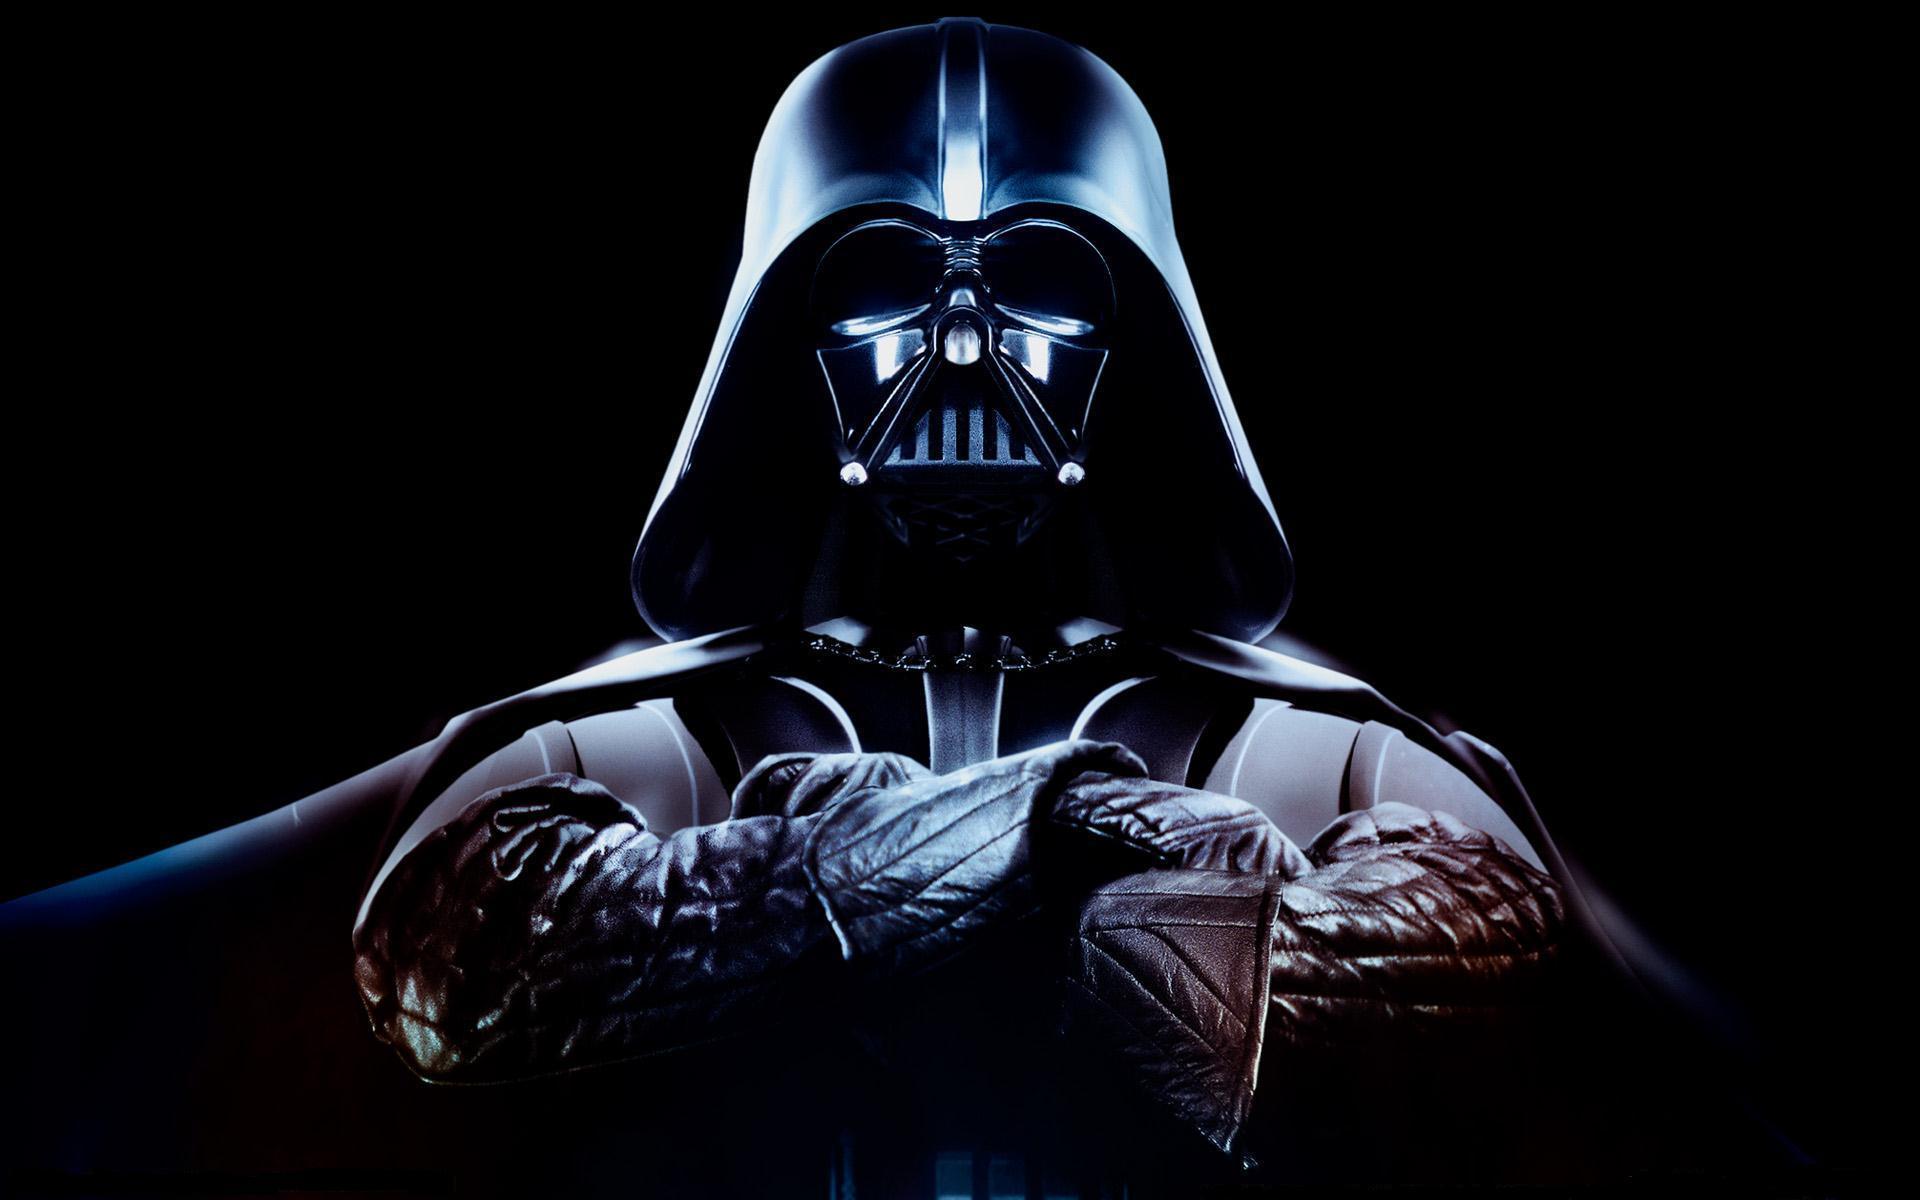 8939 baixar papel de parede Cinema, Star Wars, Darth Vader - protetores de tela e imagens gratuitamente